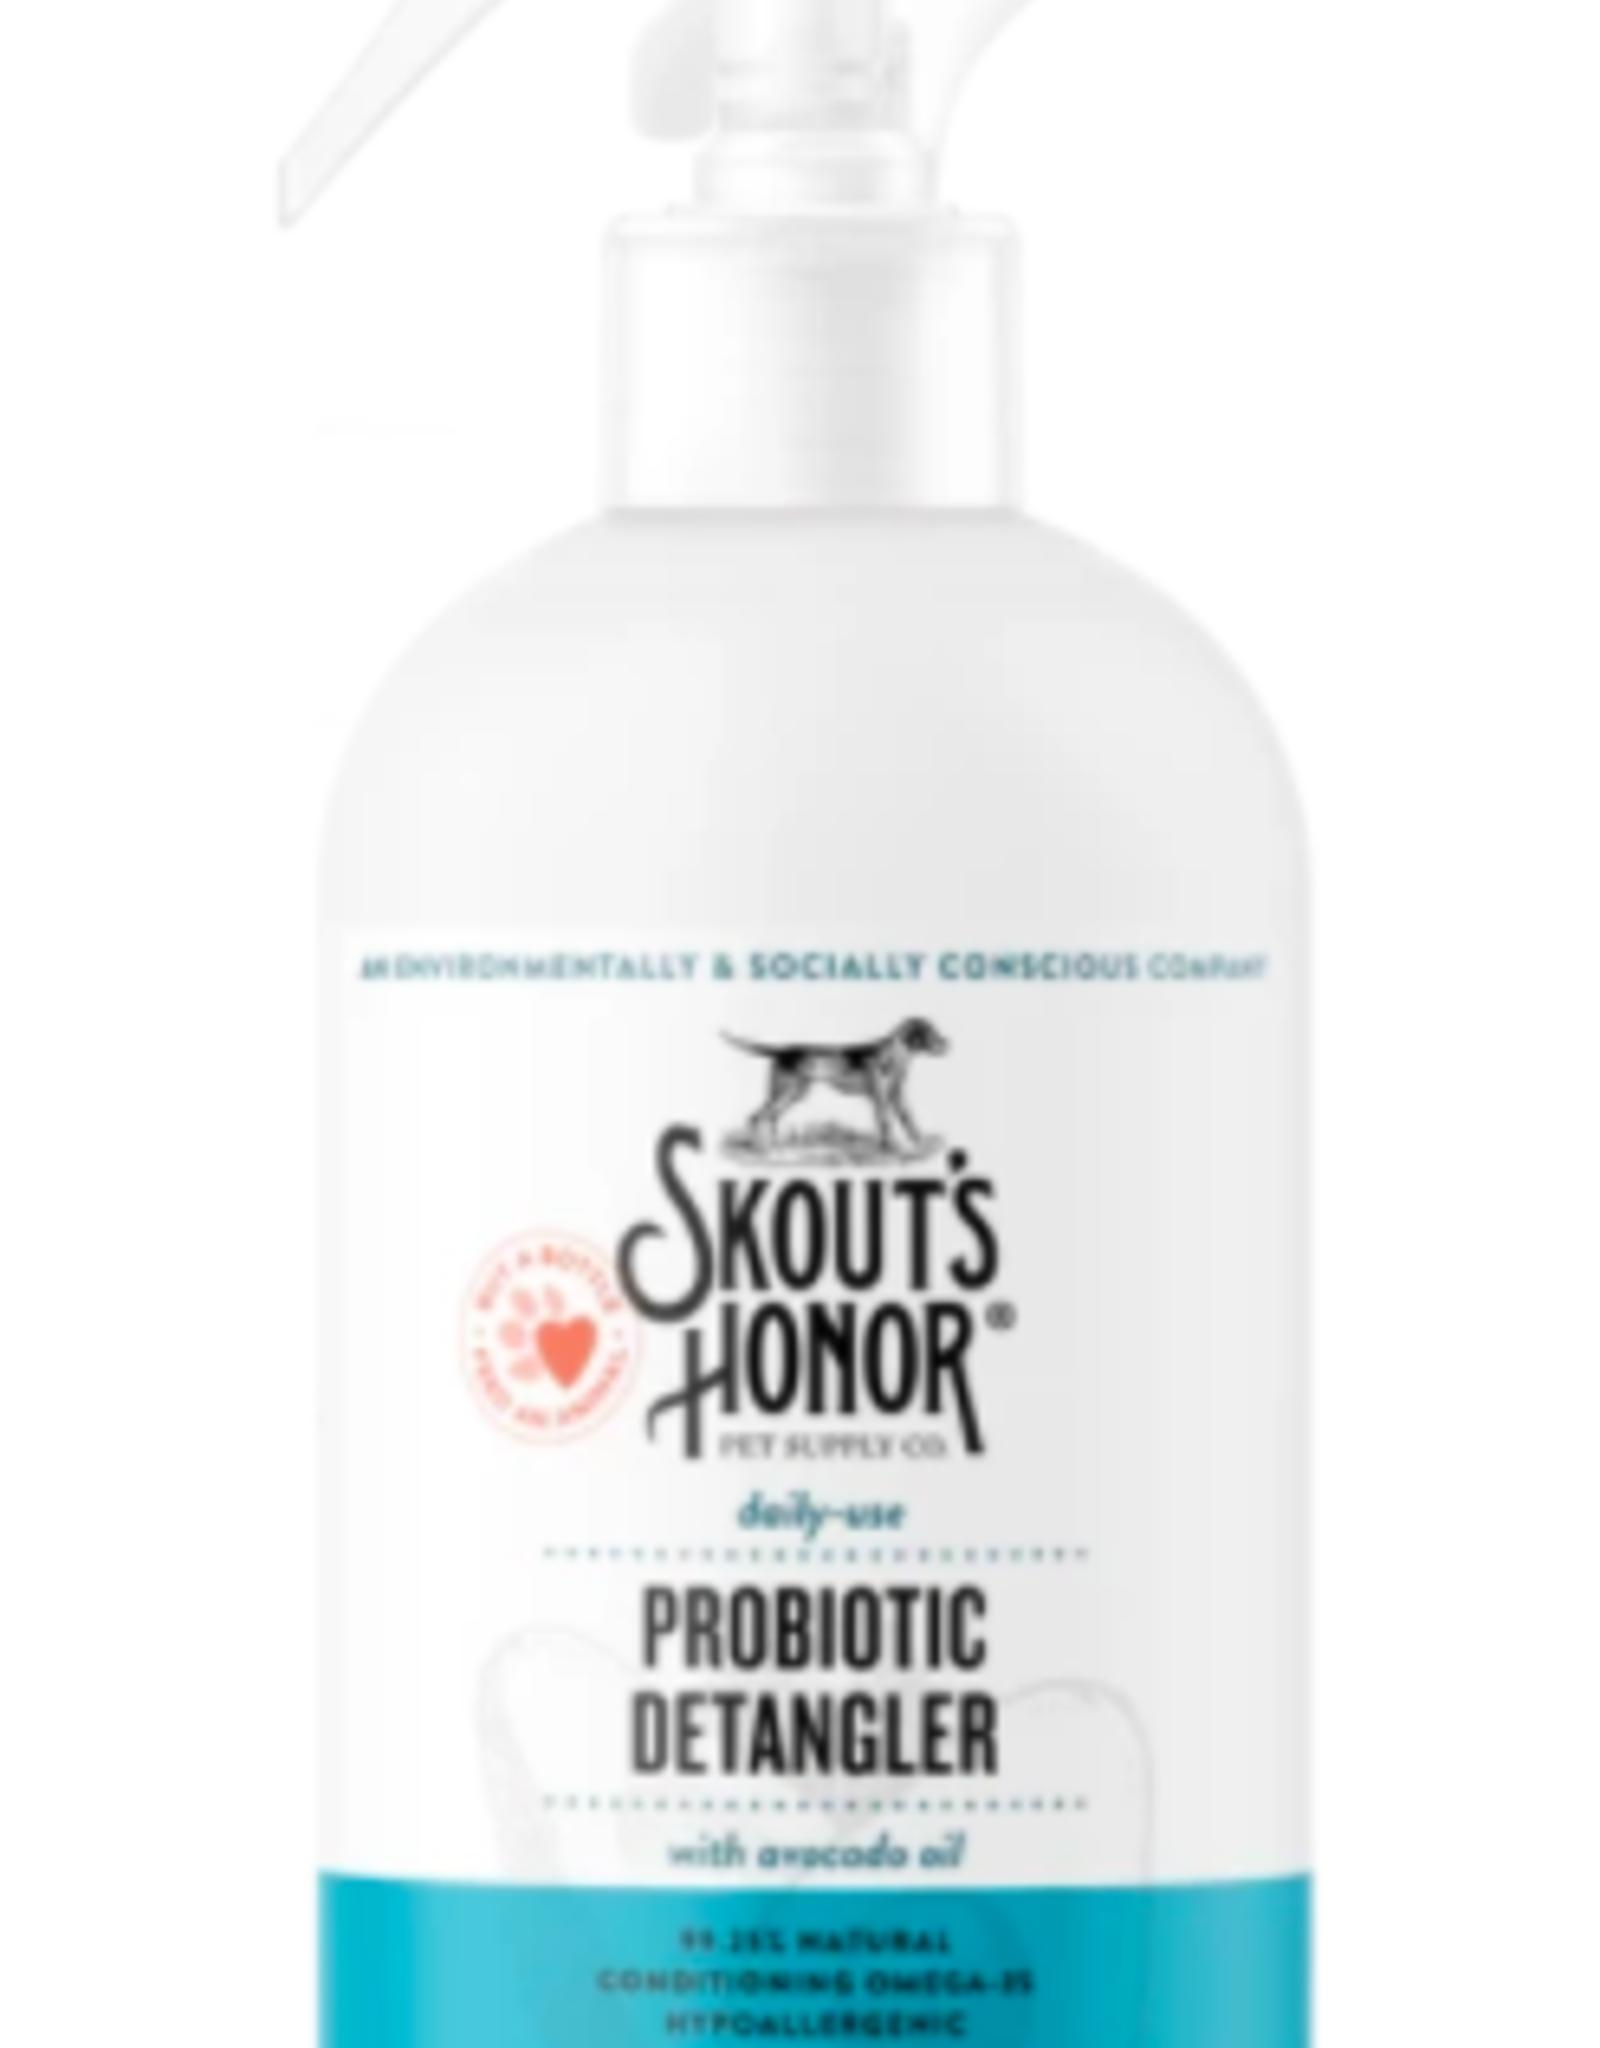 Scout's Honor Skouts Pro Detangler Unscented 8oz